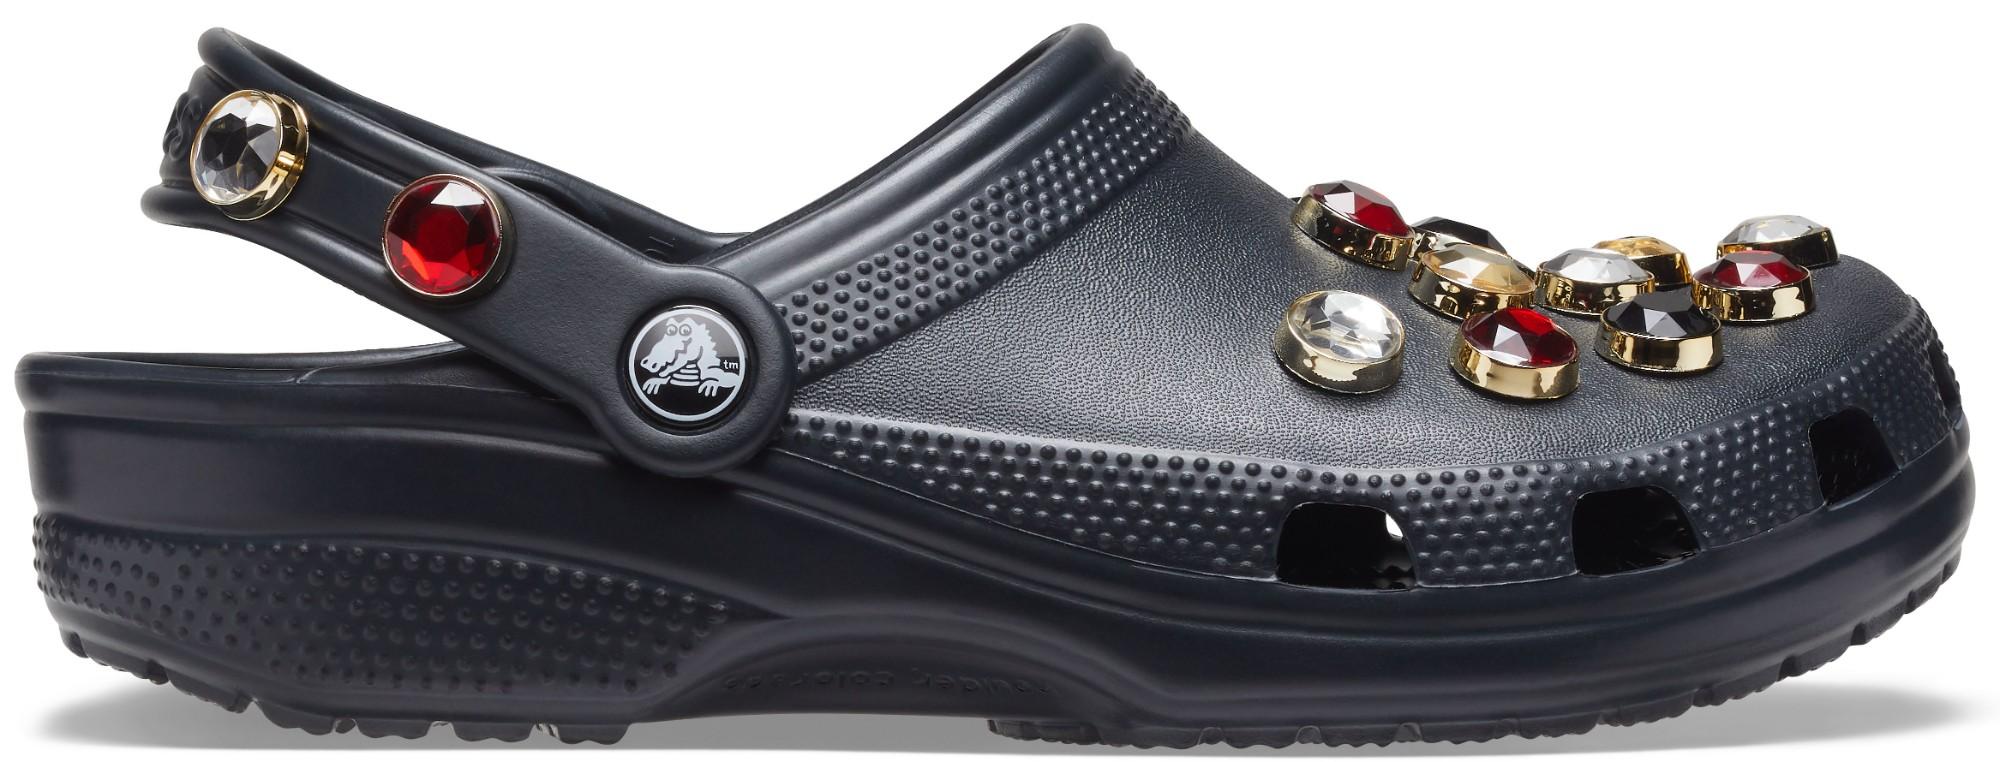 Crocs™ Classic Multi Gem Clog Black 38,5